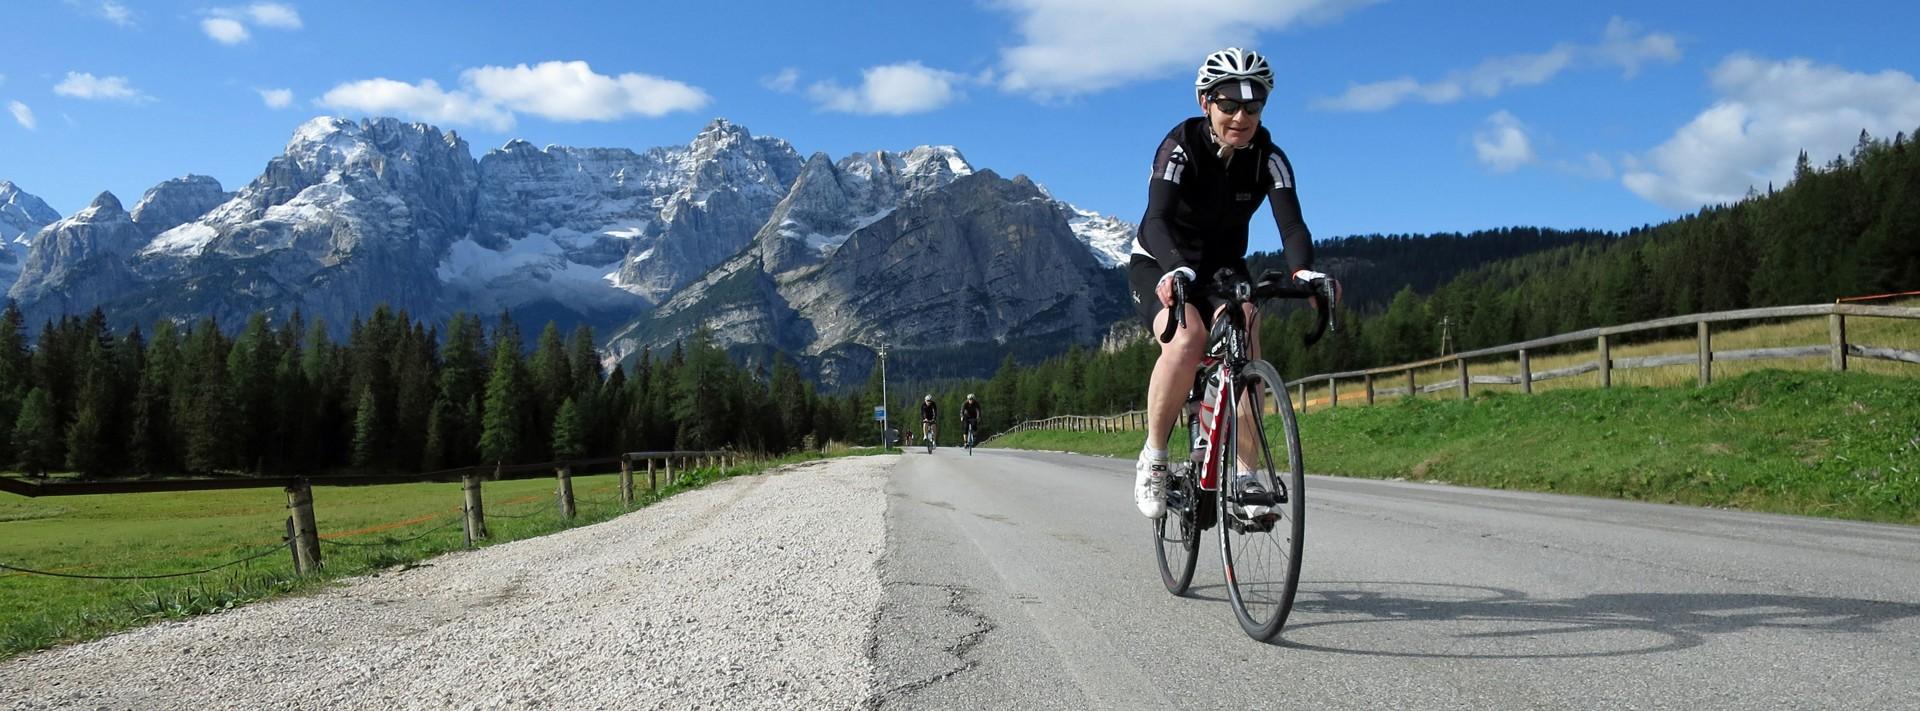 Raid Dolomiti3.jpg - Italy - Raid Dolomiti - Guided Road Cycling Holiday - Road Cycling